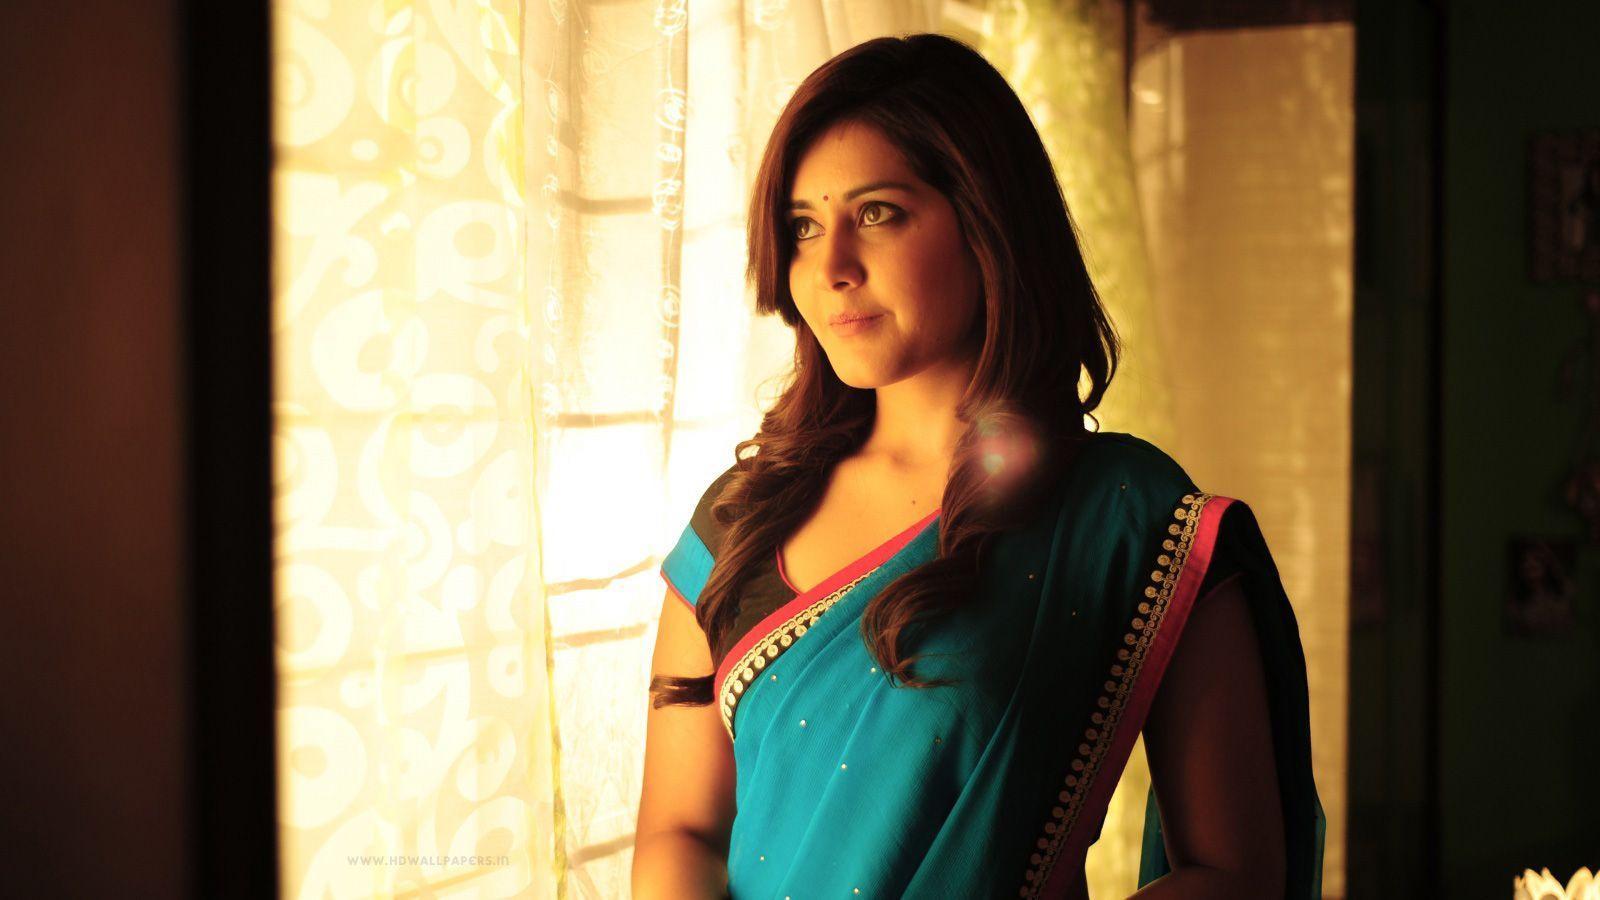 Tamil Actress Hd Wallpapers 1080p Wallpaper Cave